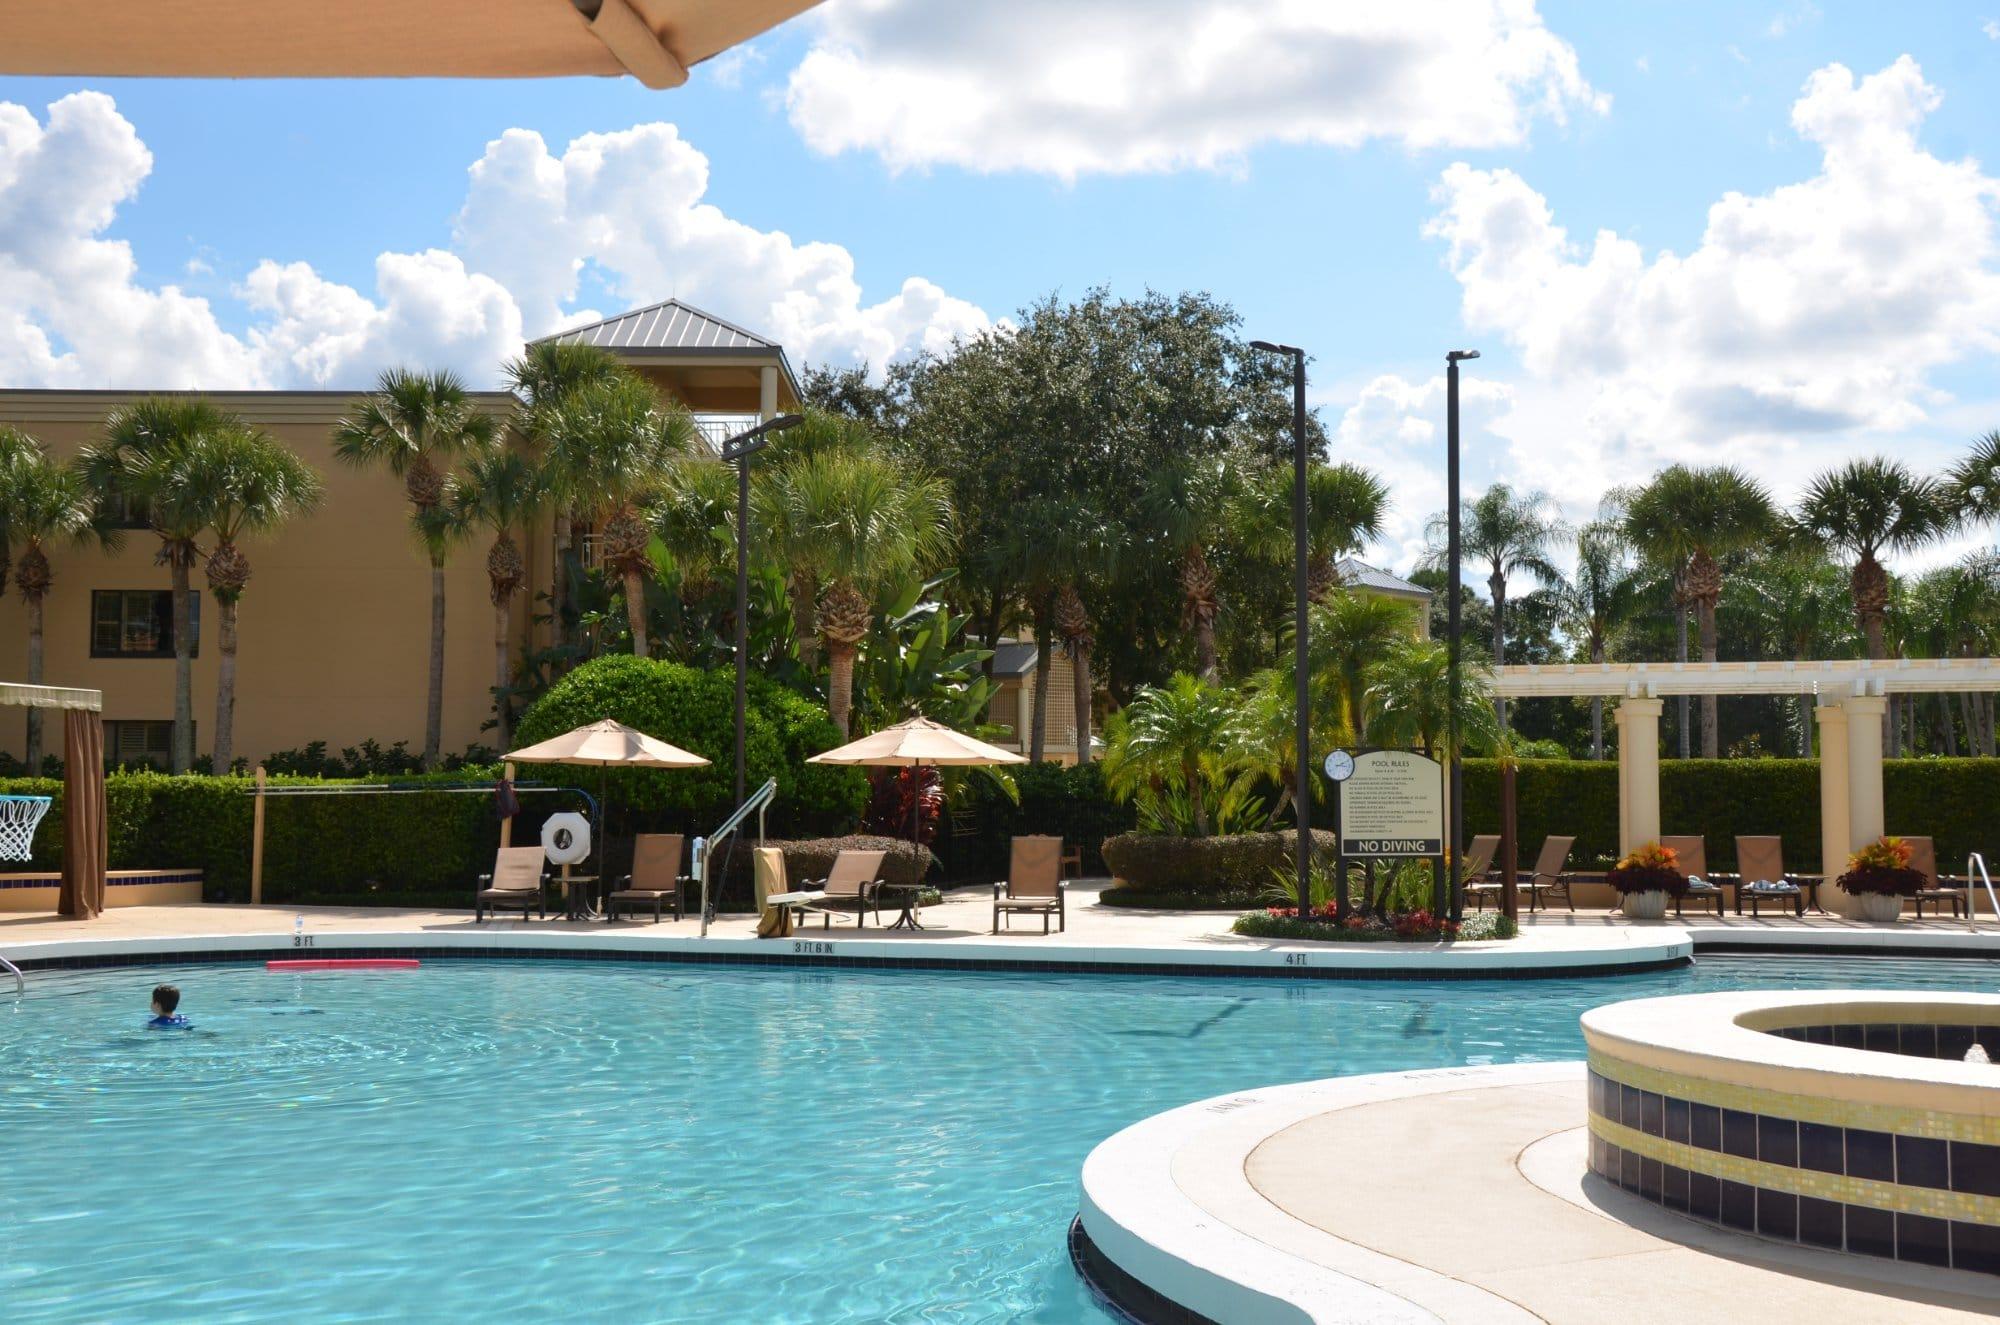 Marriott's Royal Palms Pool